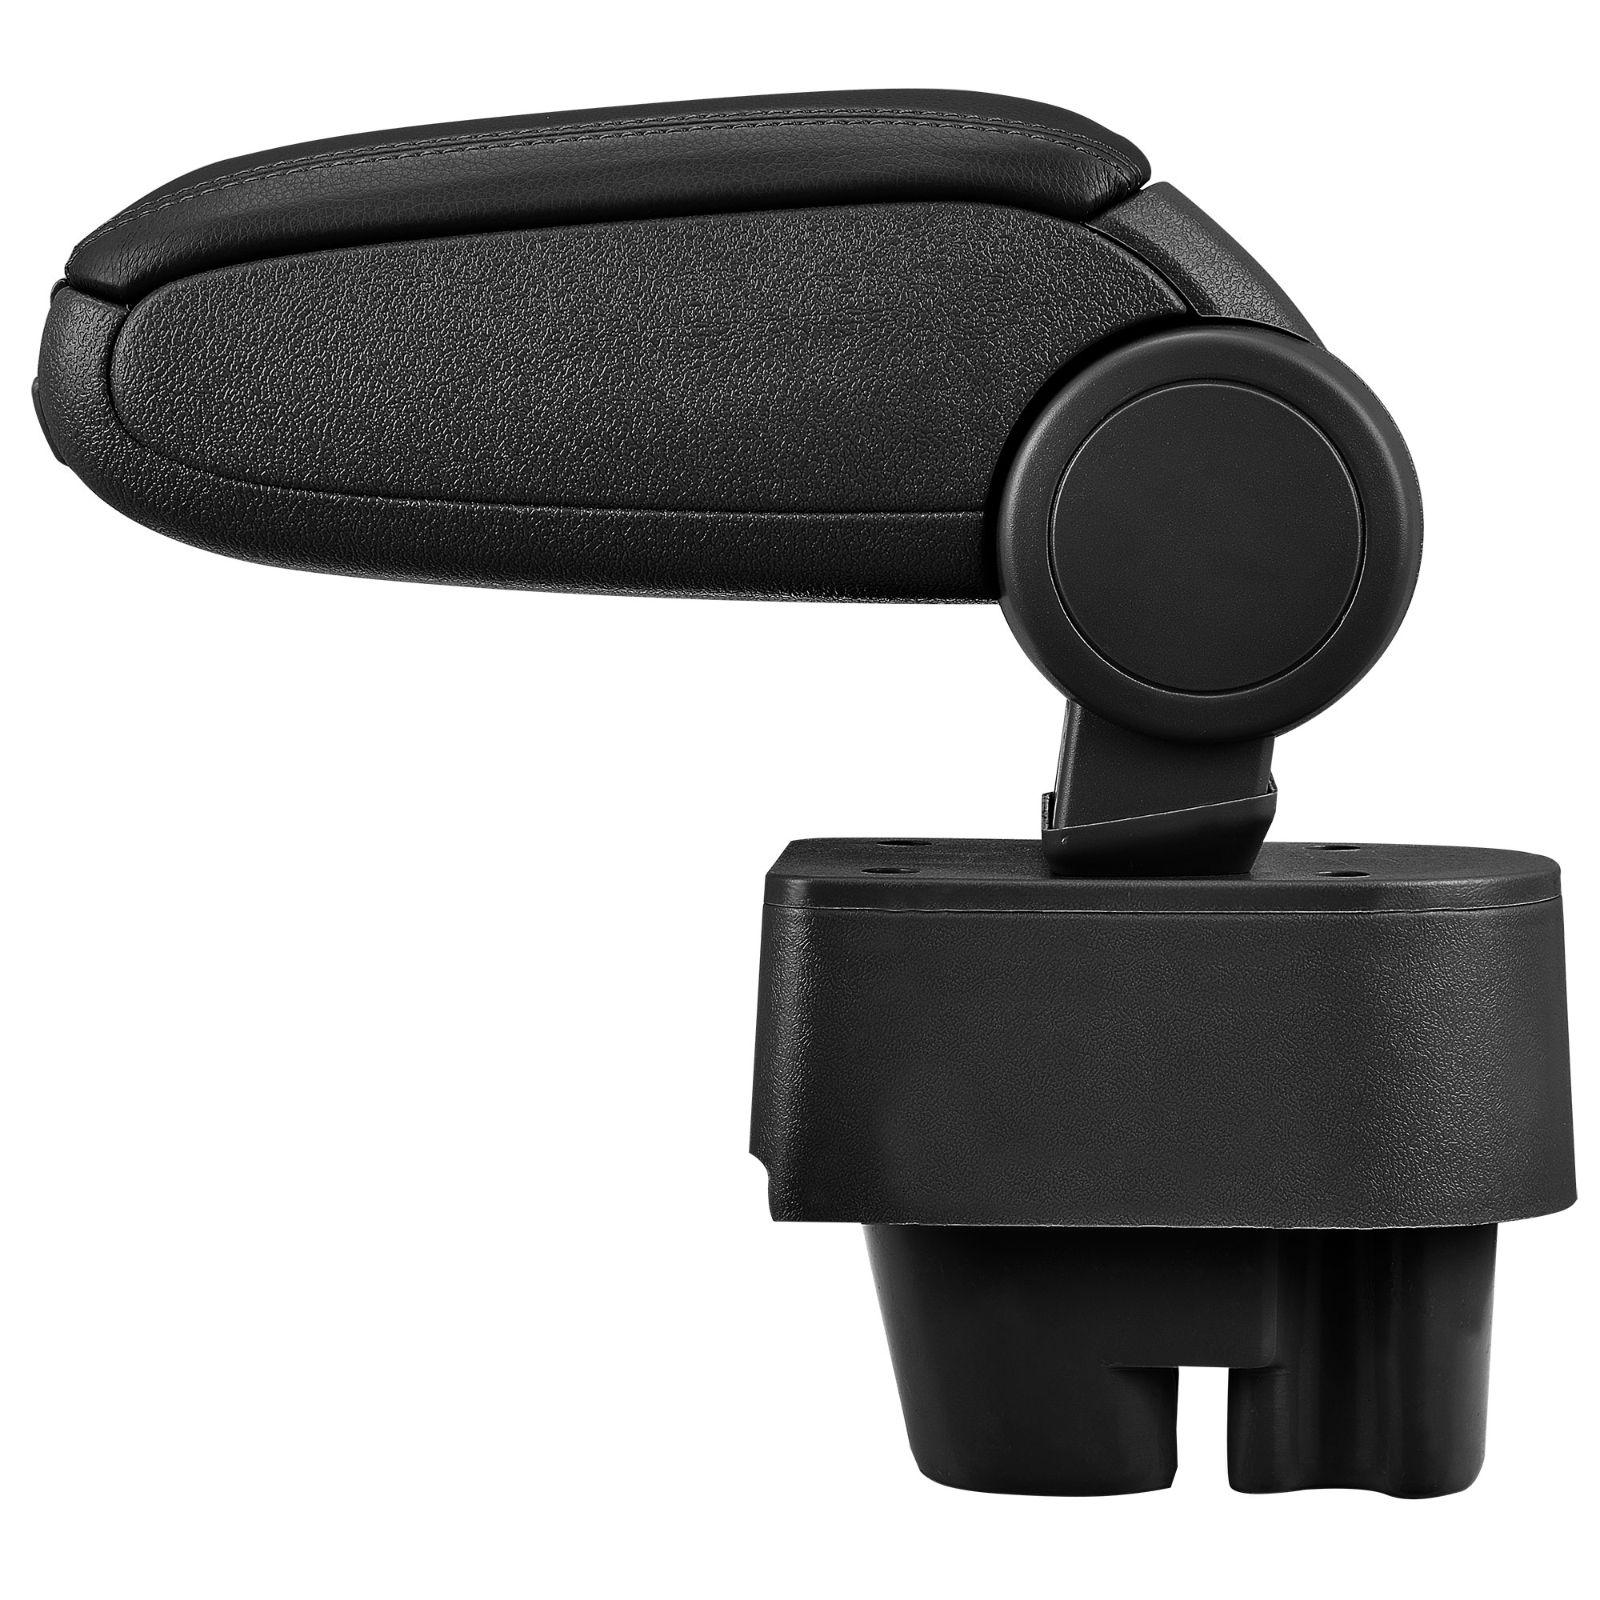 accoudoir central peugeot 207 207 cc 207 sw cuir noir neuf ebay. Black Bedroom Furniture Sets. Home Design Ideas